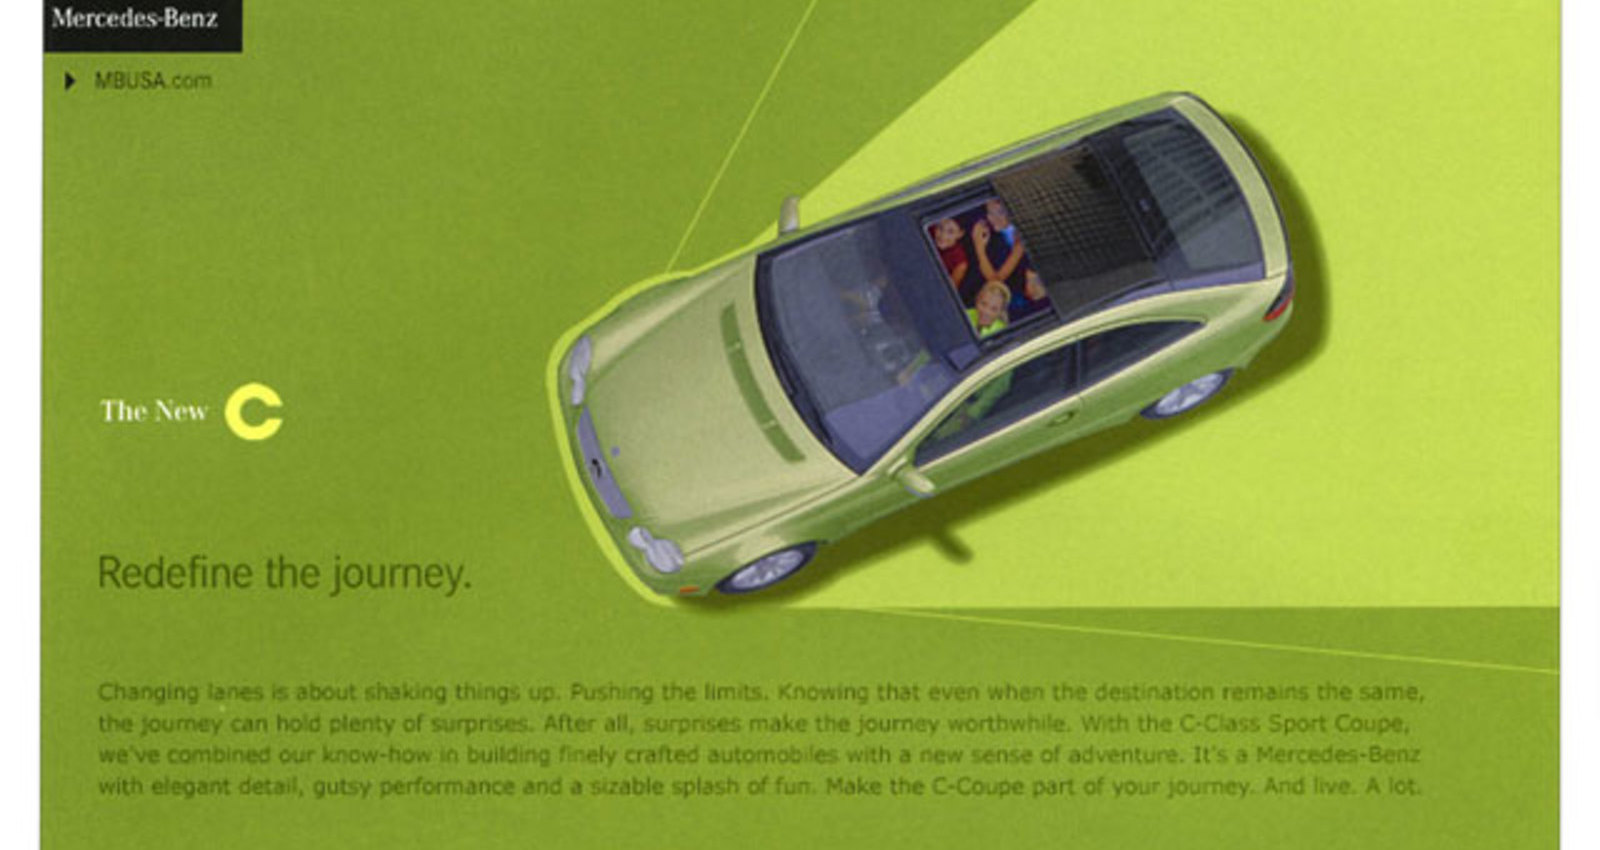 C-Coupe Campaign